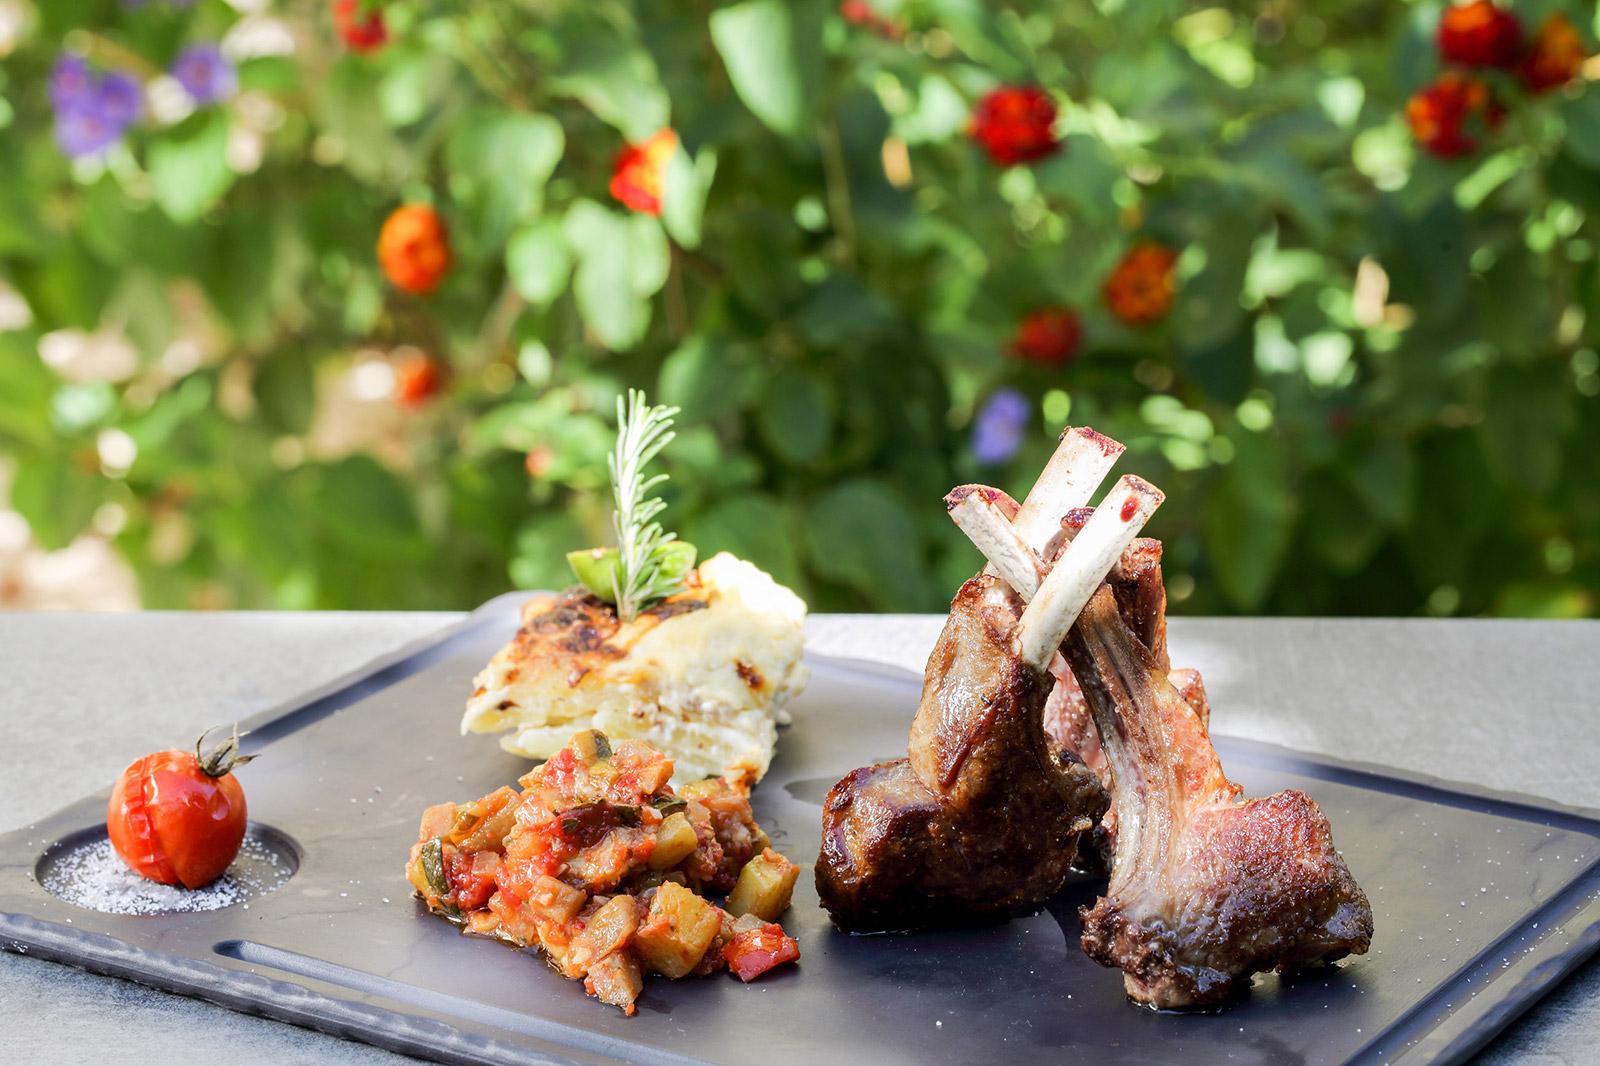 Taste the cevenol gastronomy